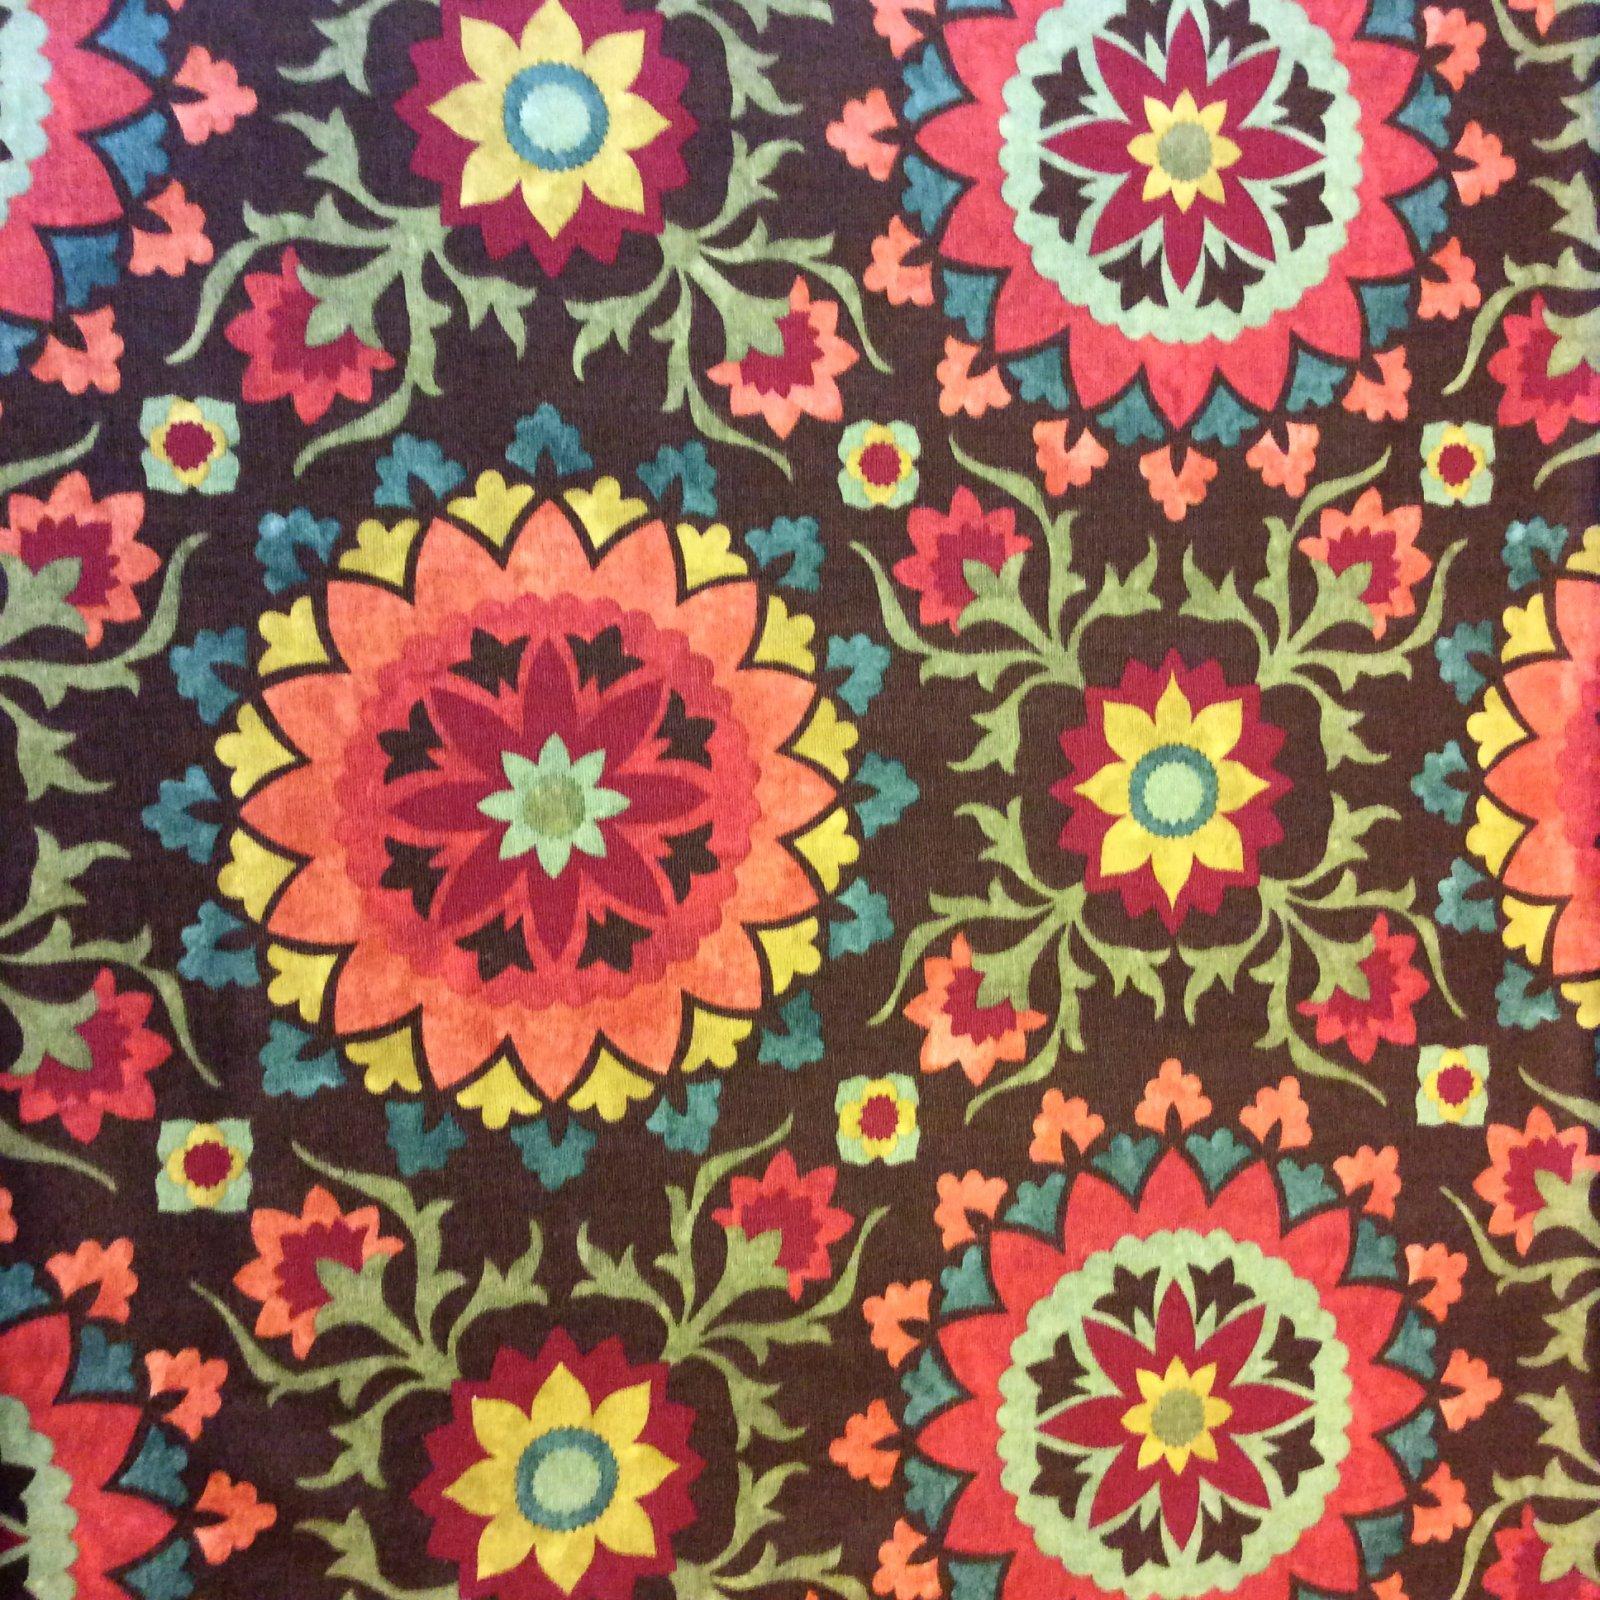 nl233 moroccan floral suzani medallion jewel tone cotton weave nl233 moroccan floral suzani medallion jewel tone cotton weave home decor fabric